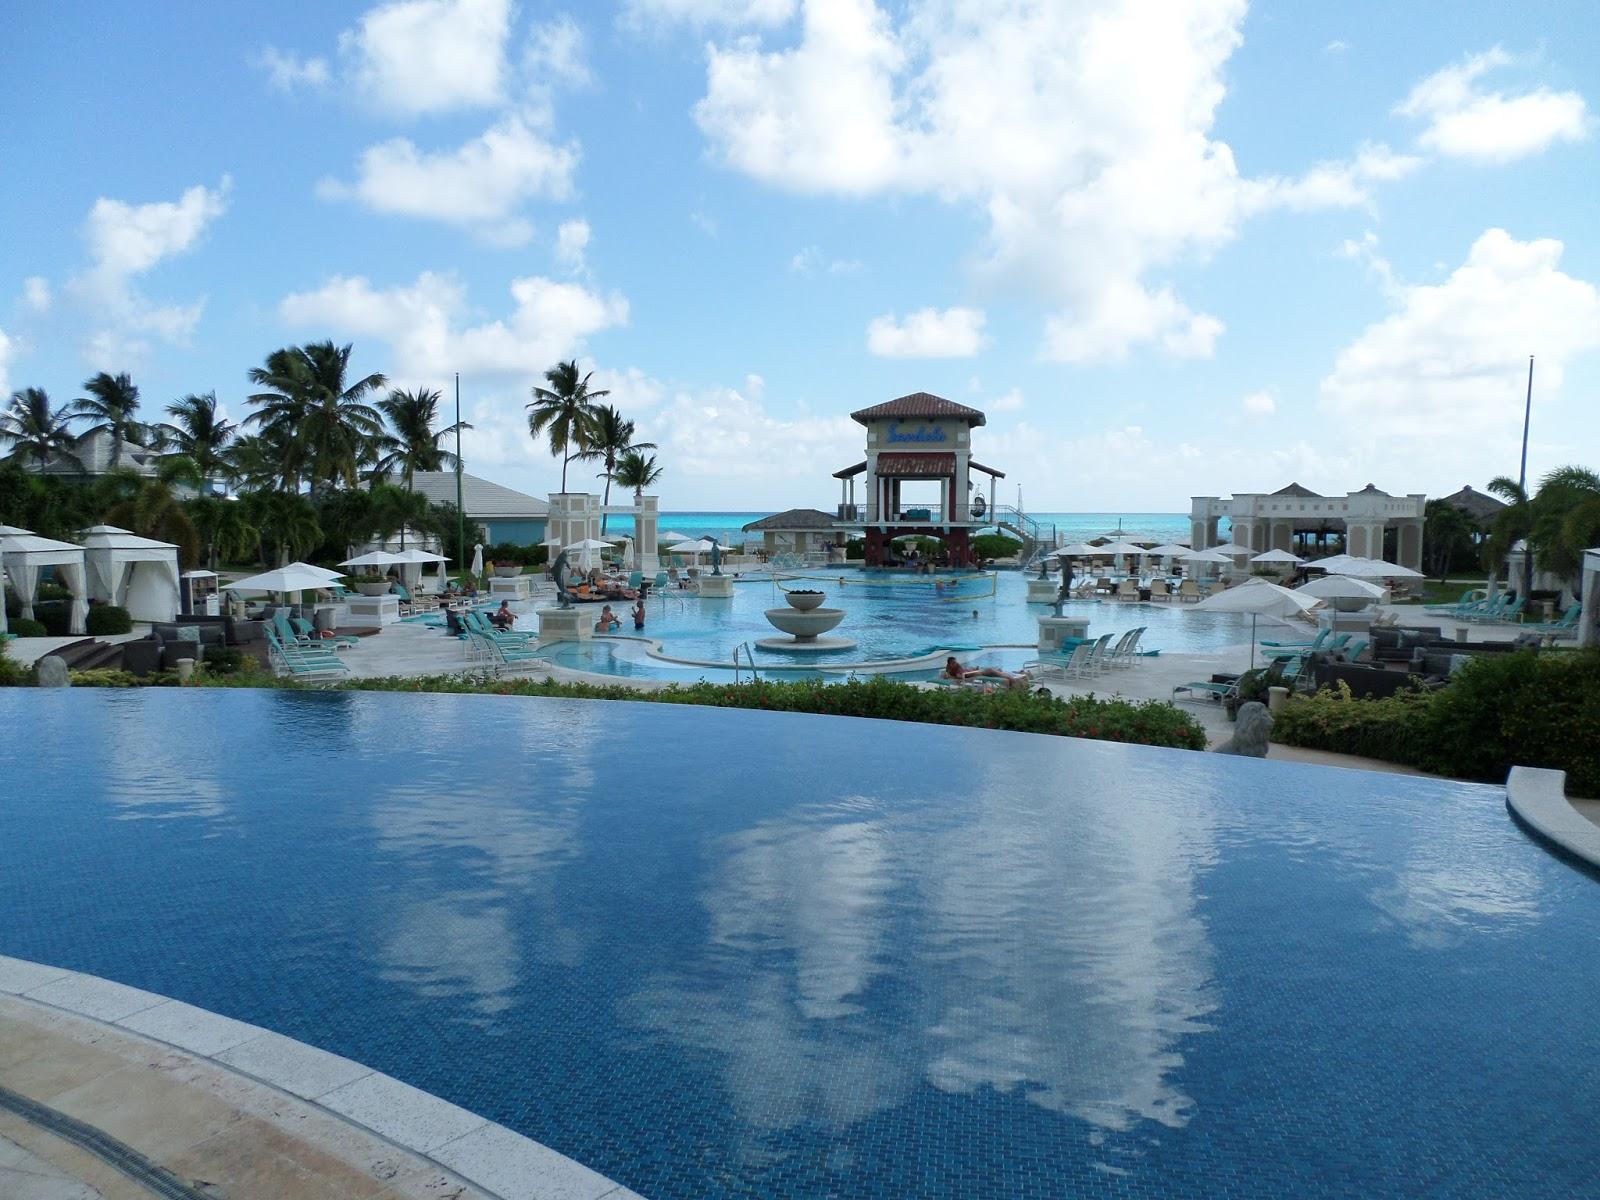 Spotlight on: Sandals Emerald Bay, Exumas, Bahamas